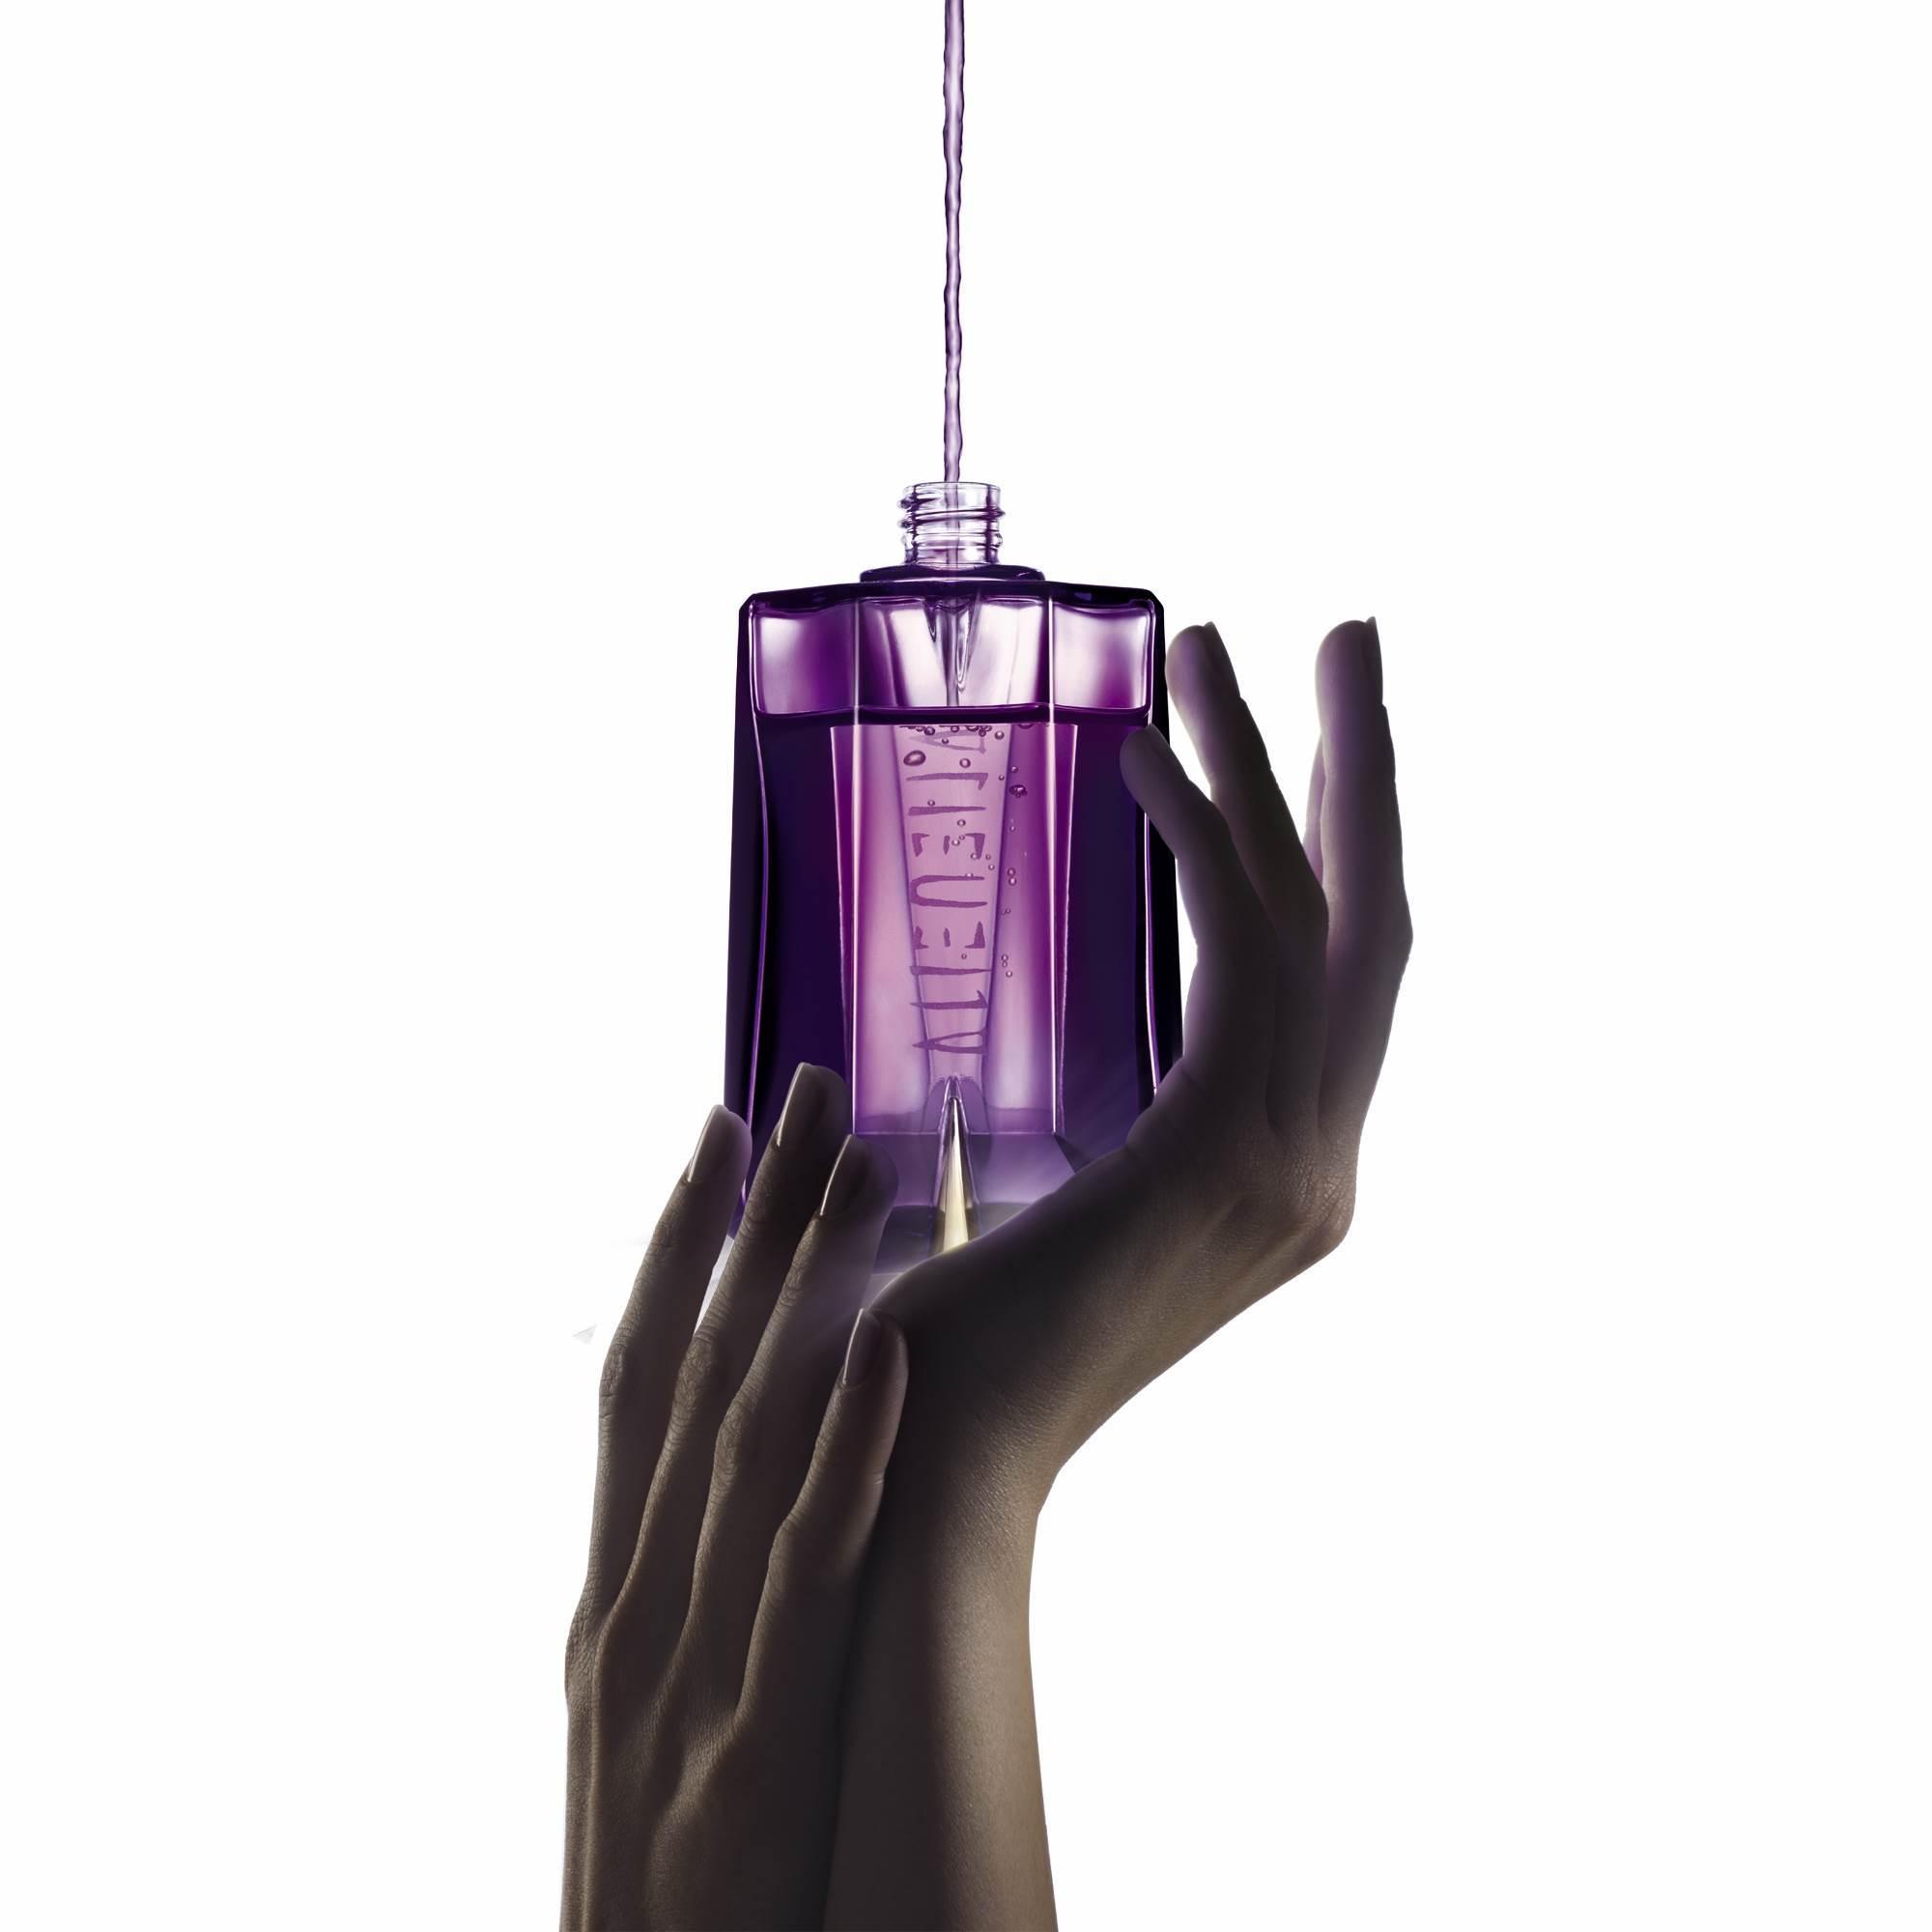 Refill Service Eau De Parfum 90ml Source Thierry Mugler Alien Eau